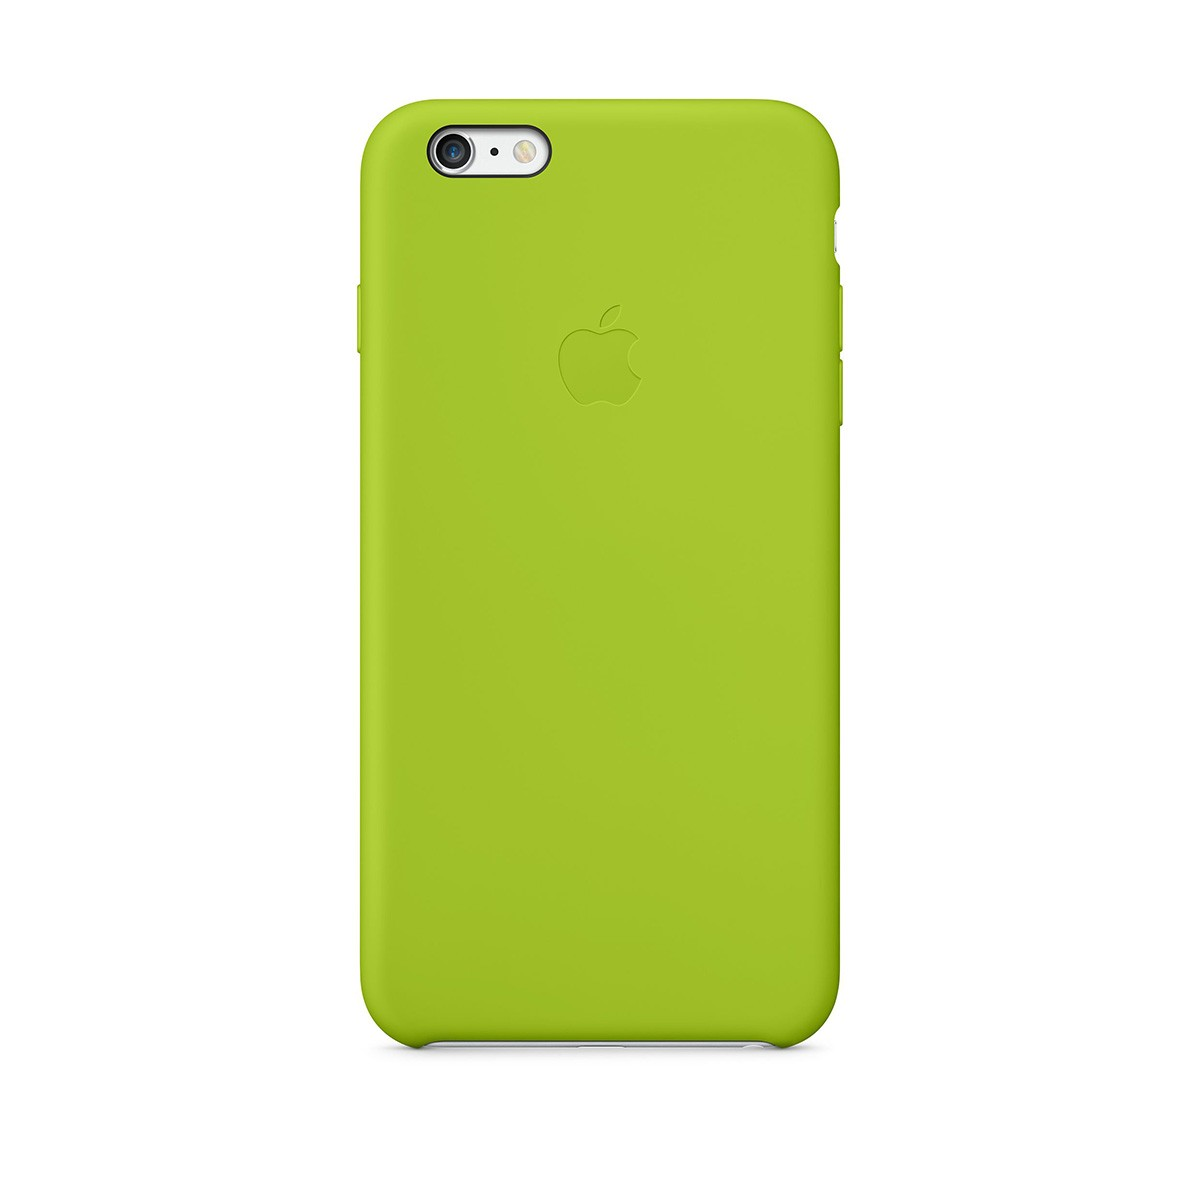 Apple Silikonový kryt na iPhone 6 Plus - zelený